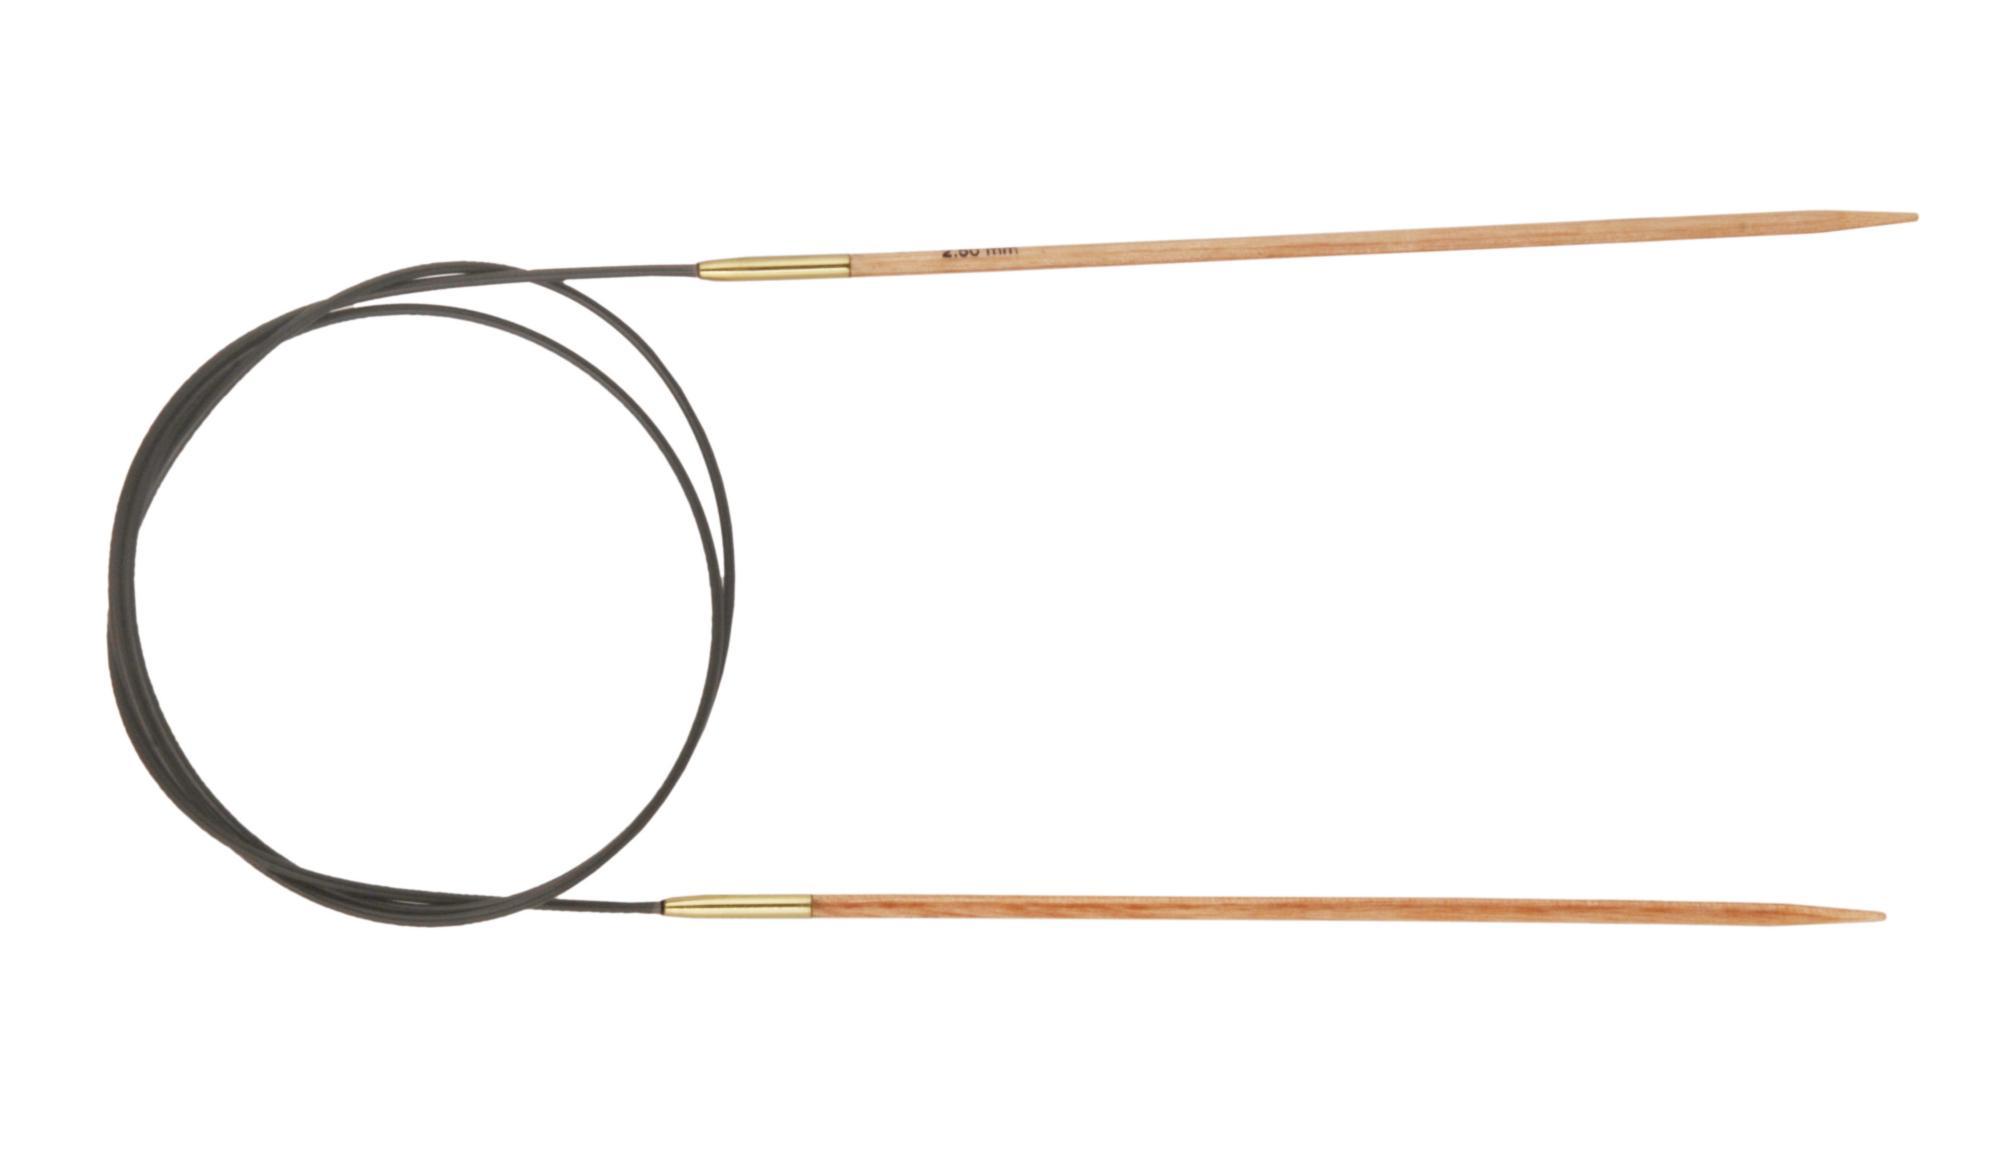 Спицы круговые 100 см Basix Birch Wood KnitPro, 35613, 2.50 мм